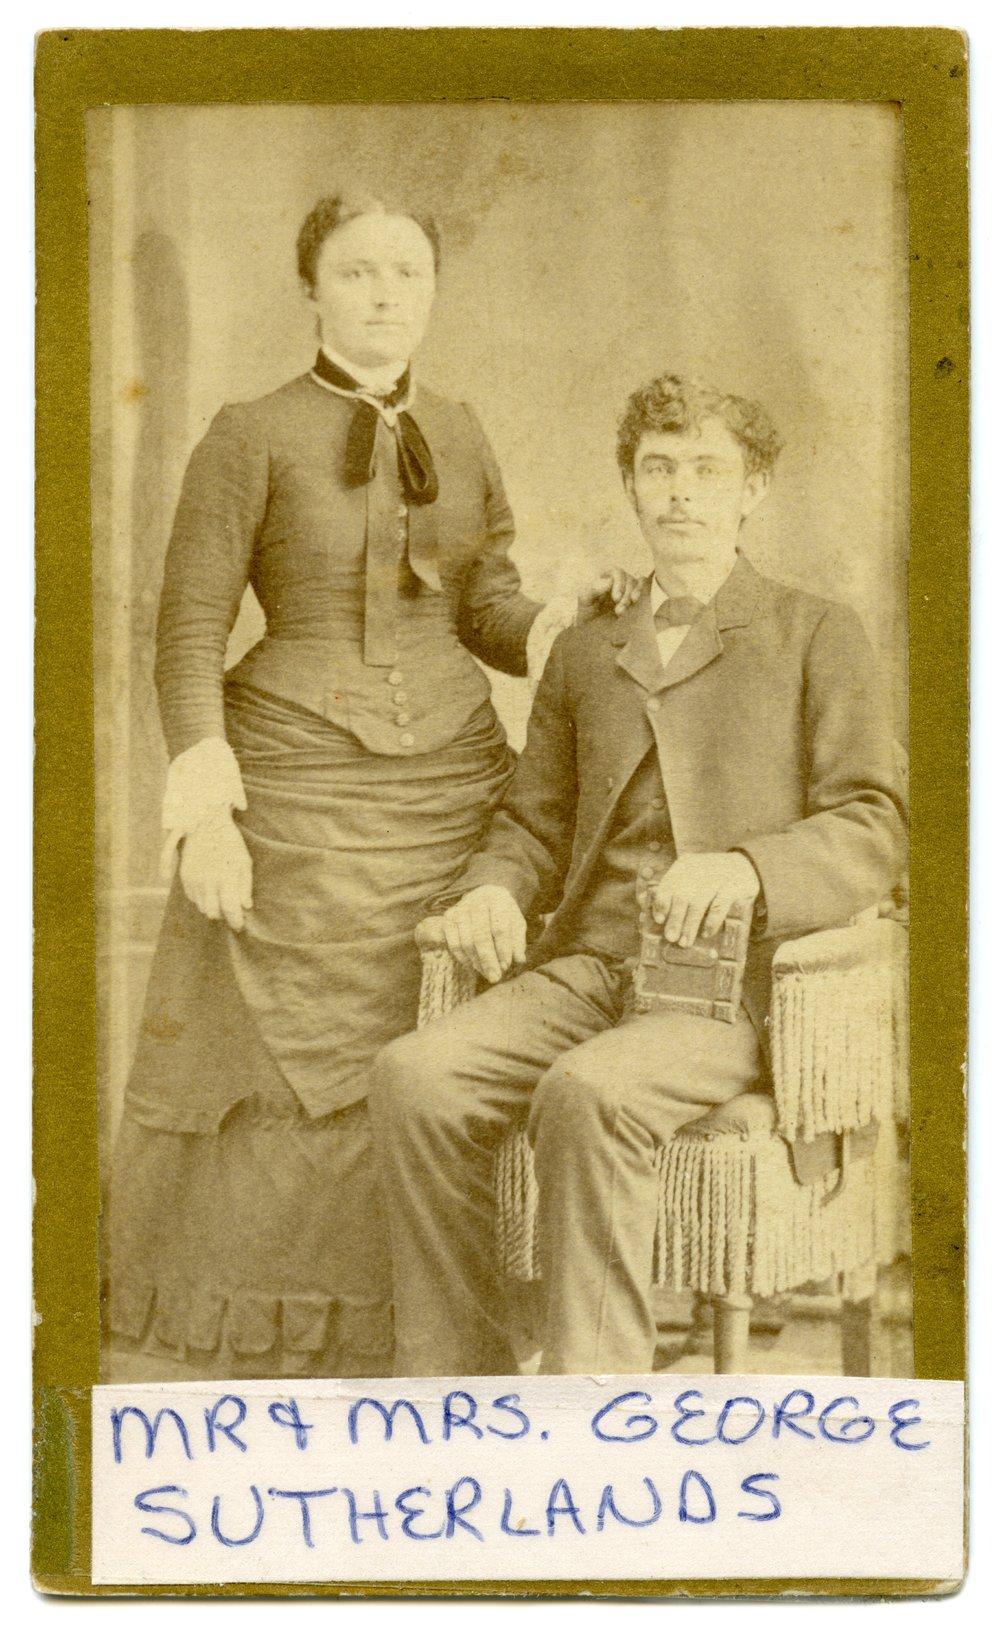 Mr. and Mrs. George Sutherland